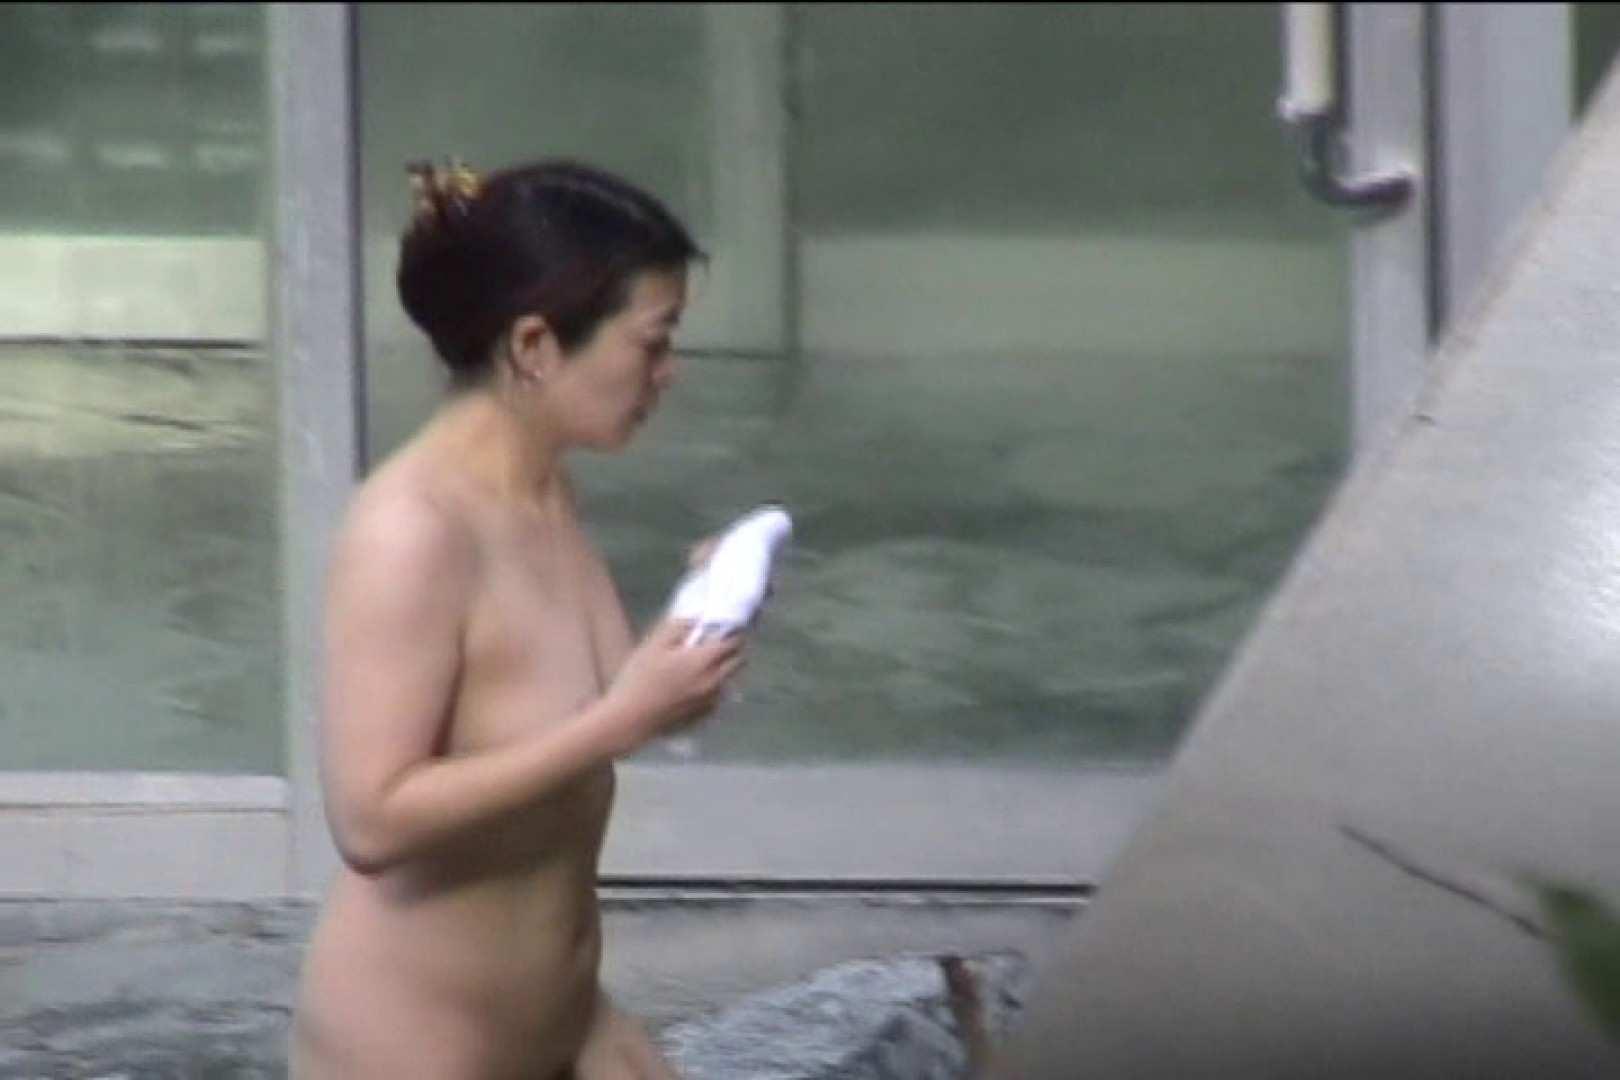 Aquaな露天風呂Vol.451 露天 オメコ無修正動画無料 66画像 2